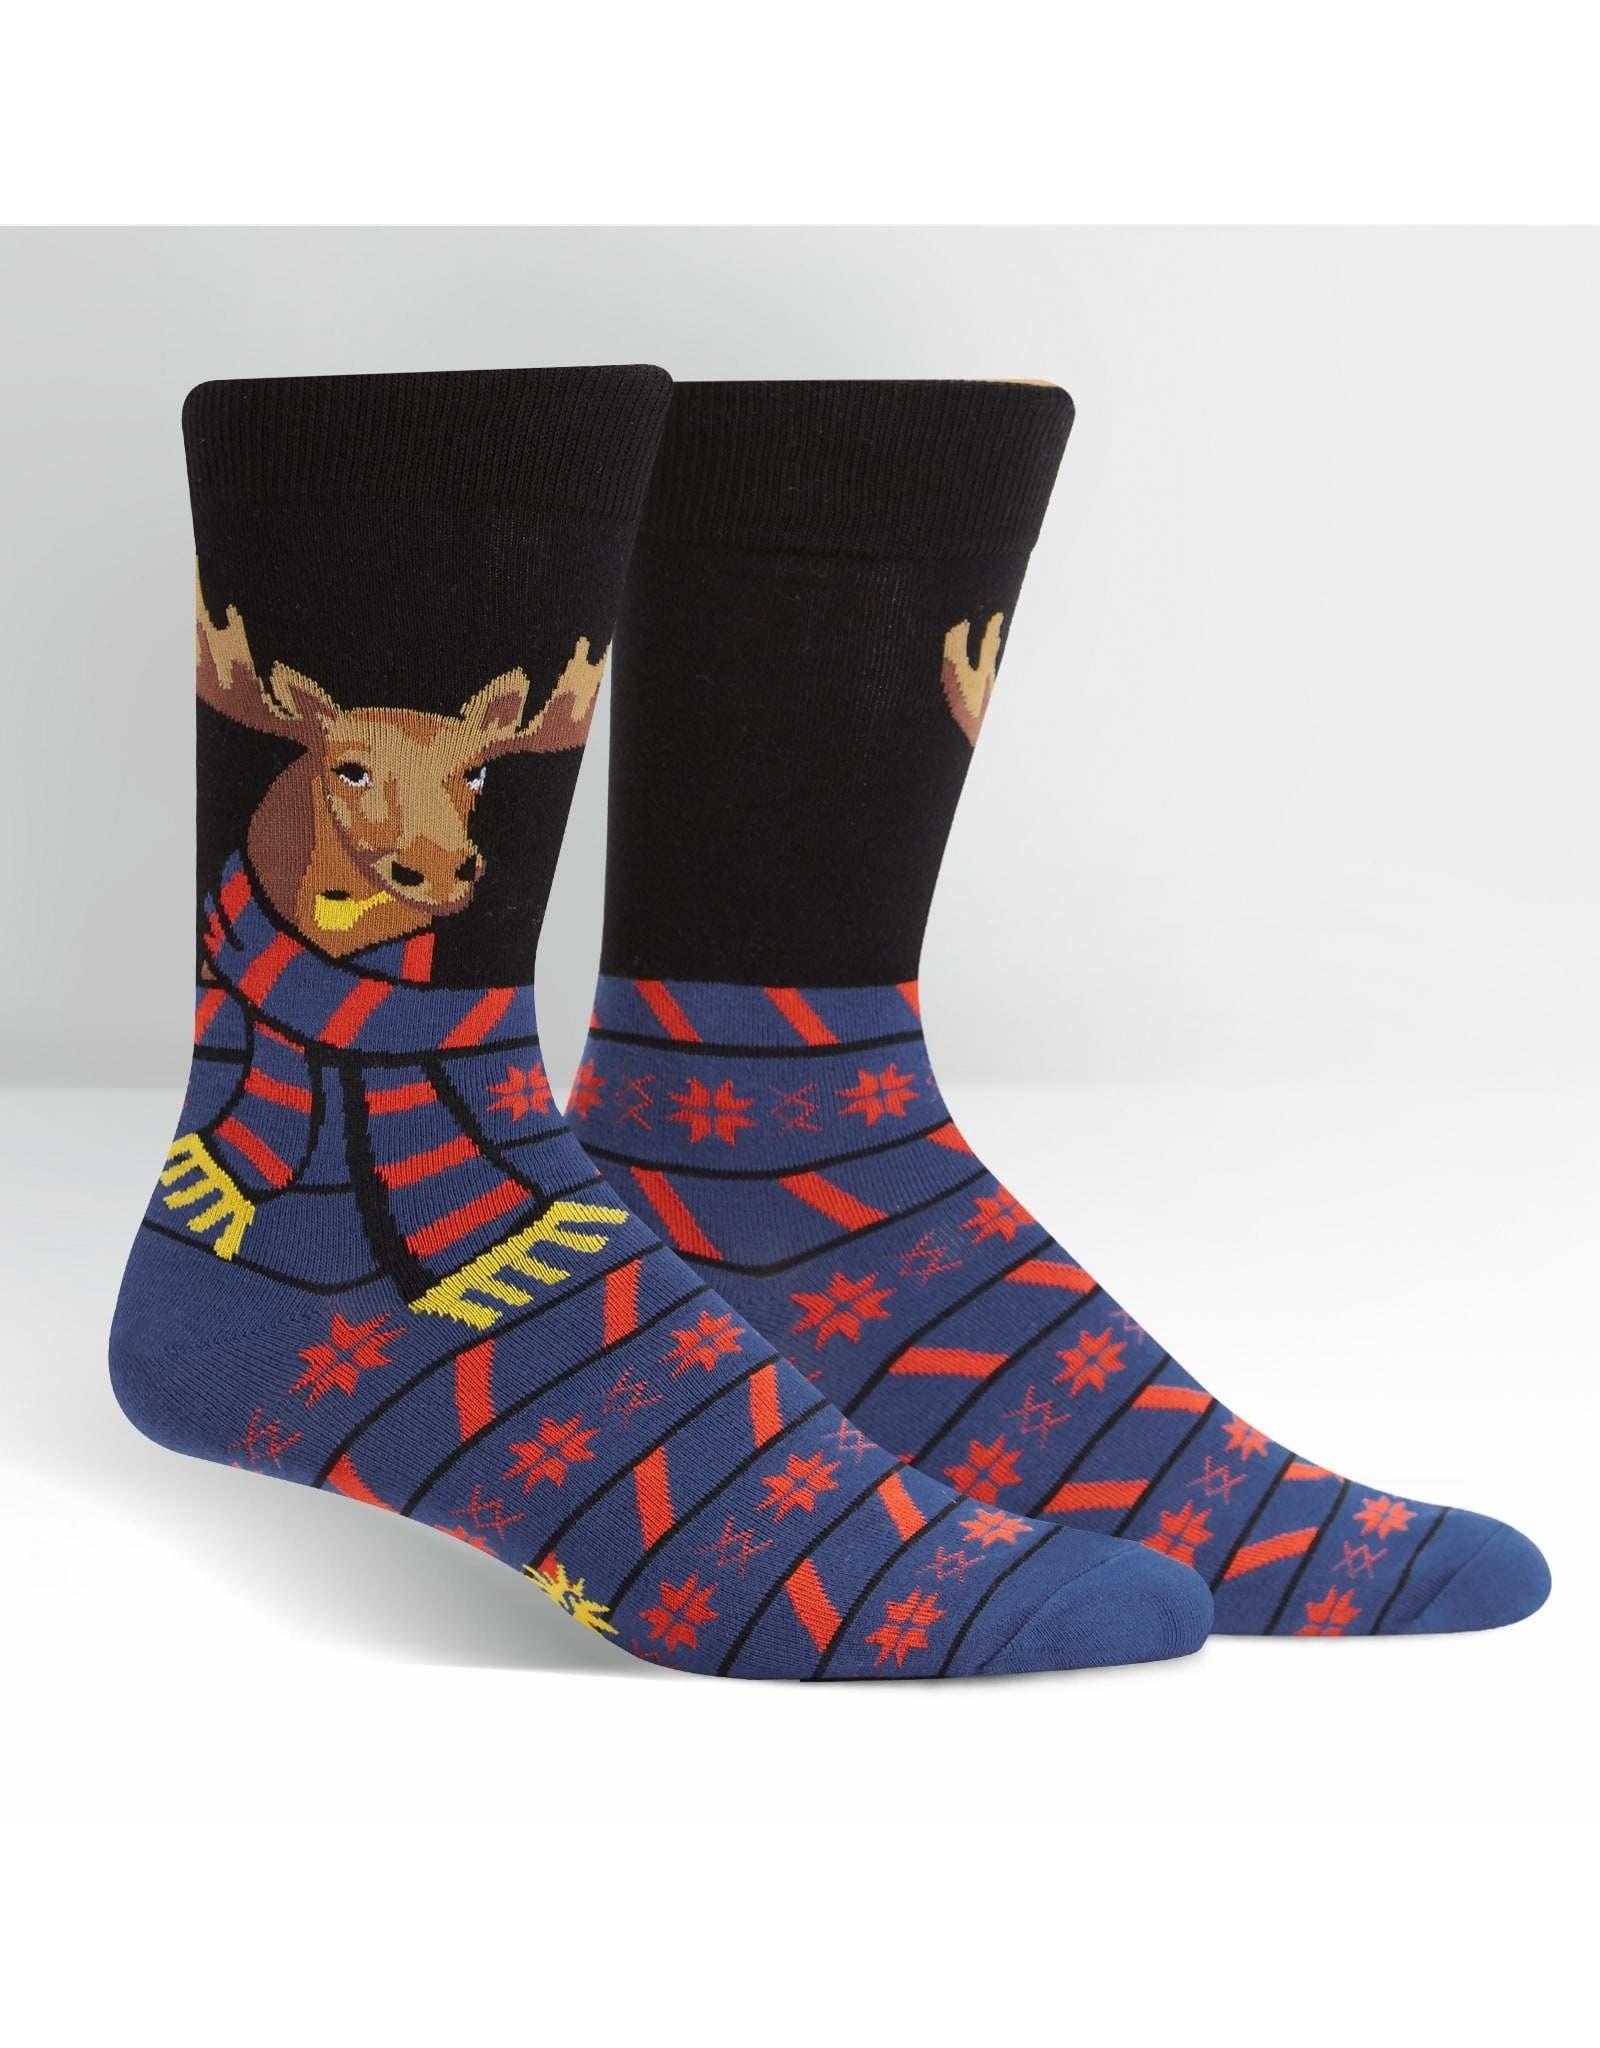 SOCK IT TO ME - Men's All Bundled Up Crew Socks